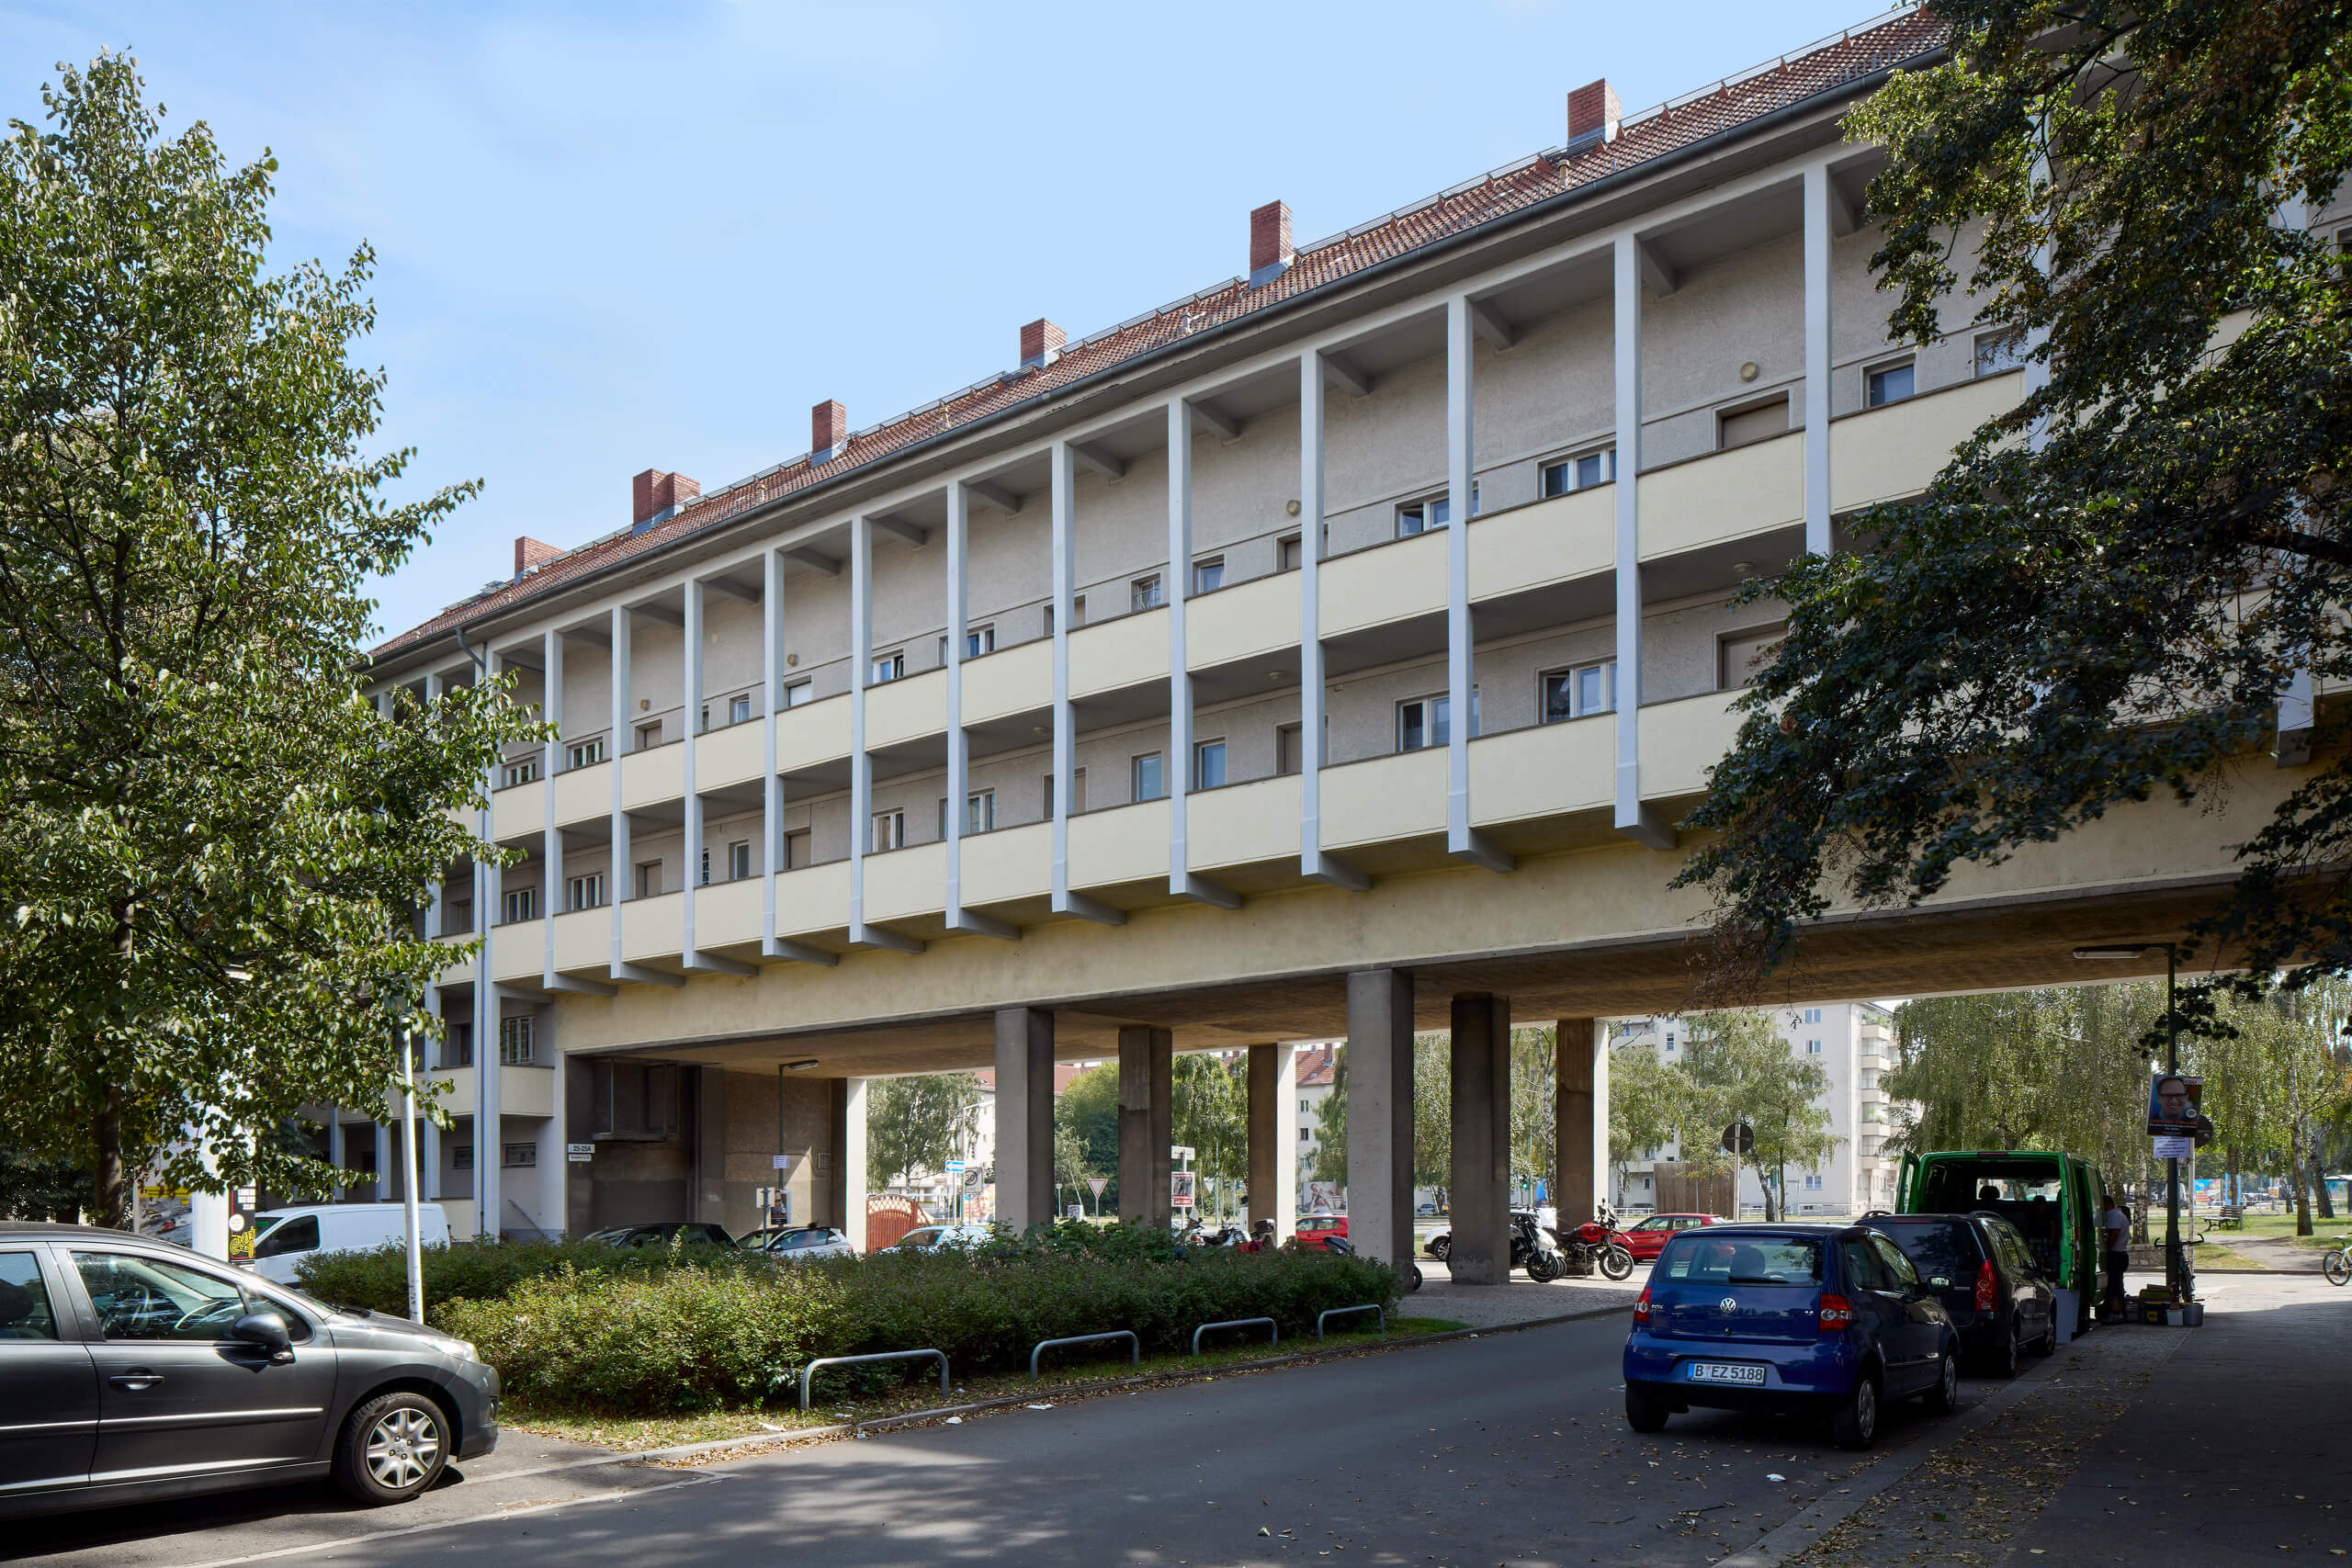 Friedrich Ebert Siedlung – Bruno Taut – Berlin – Germany